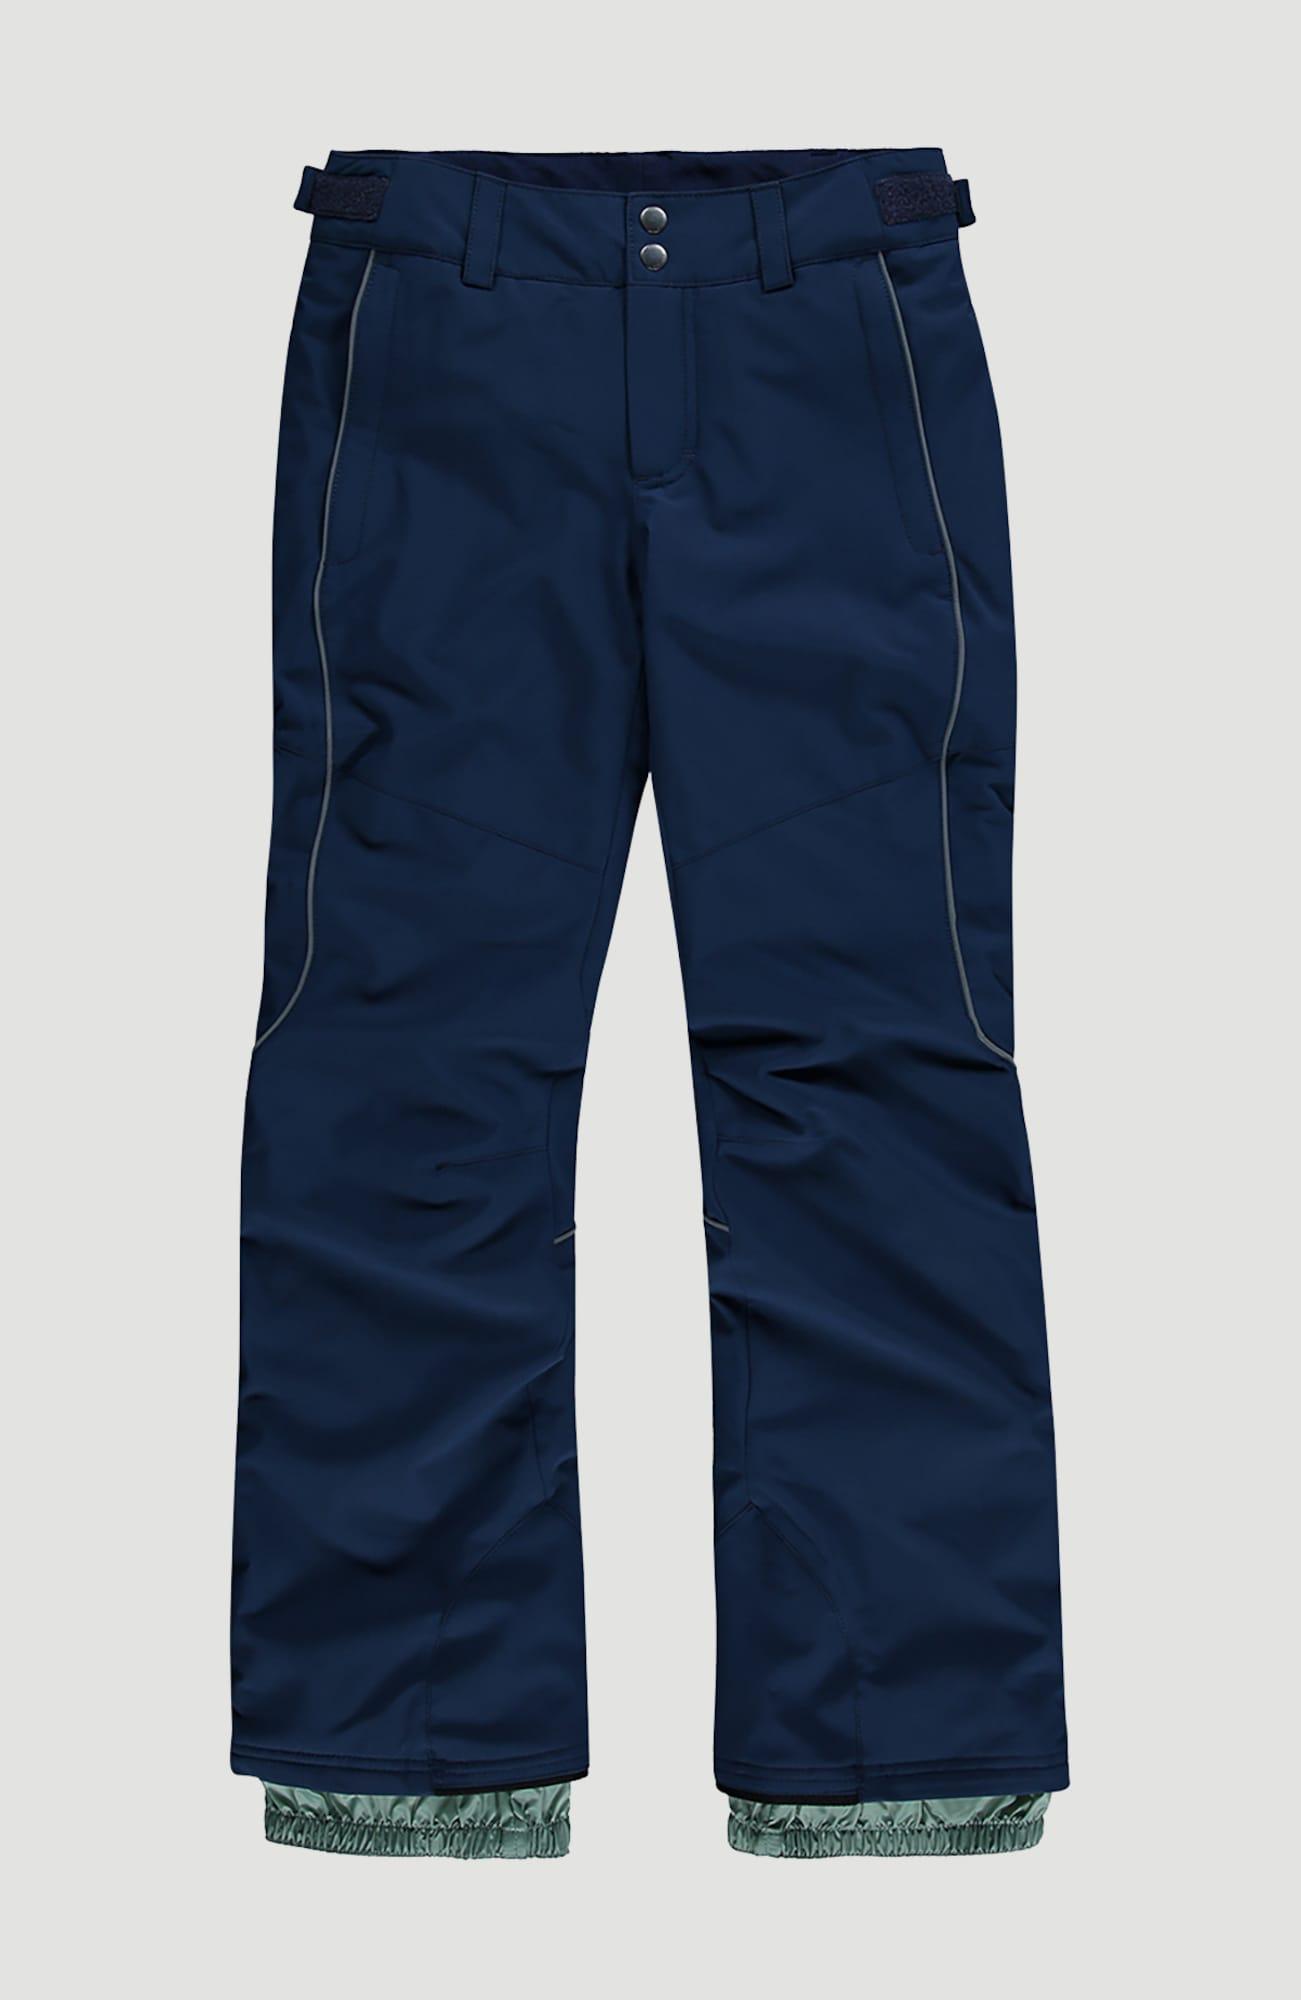 O'NEILL Sportinės kelnės mėlyna